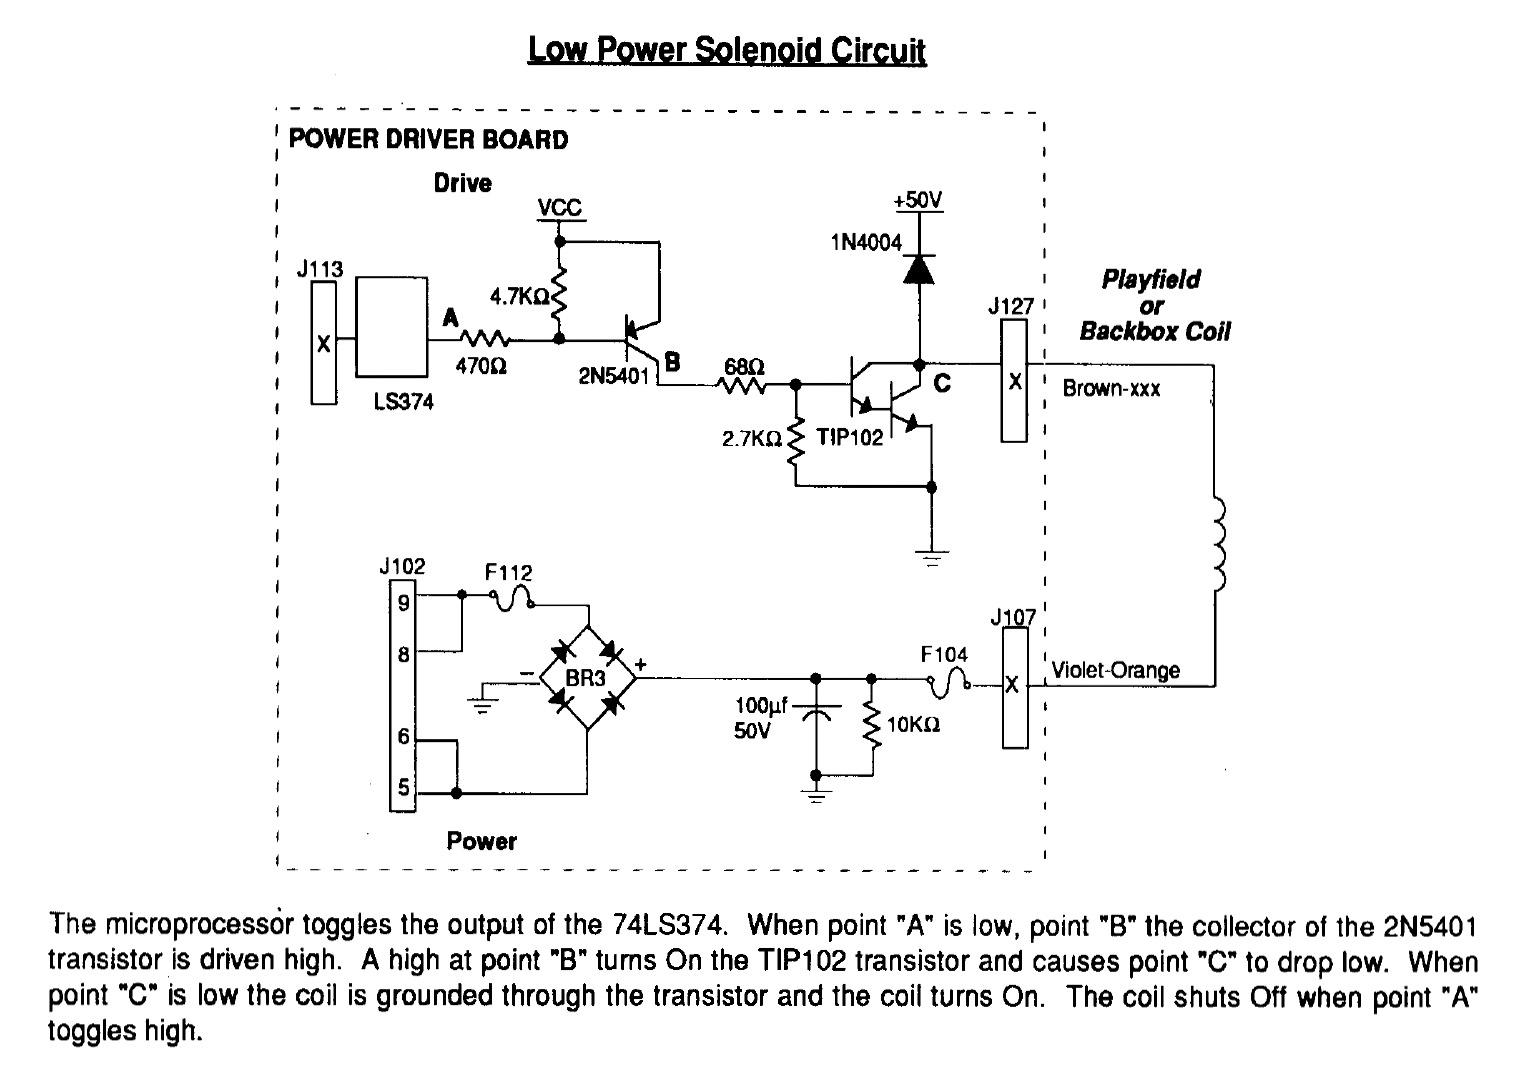 solenoid power wiring ezgo diagram golf cart pinball chameleon 39s guide to diy machine